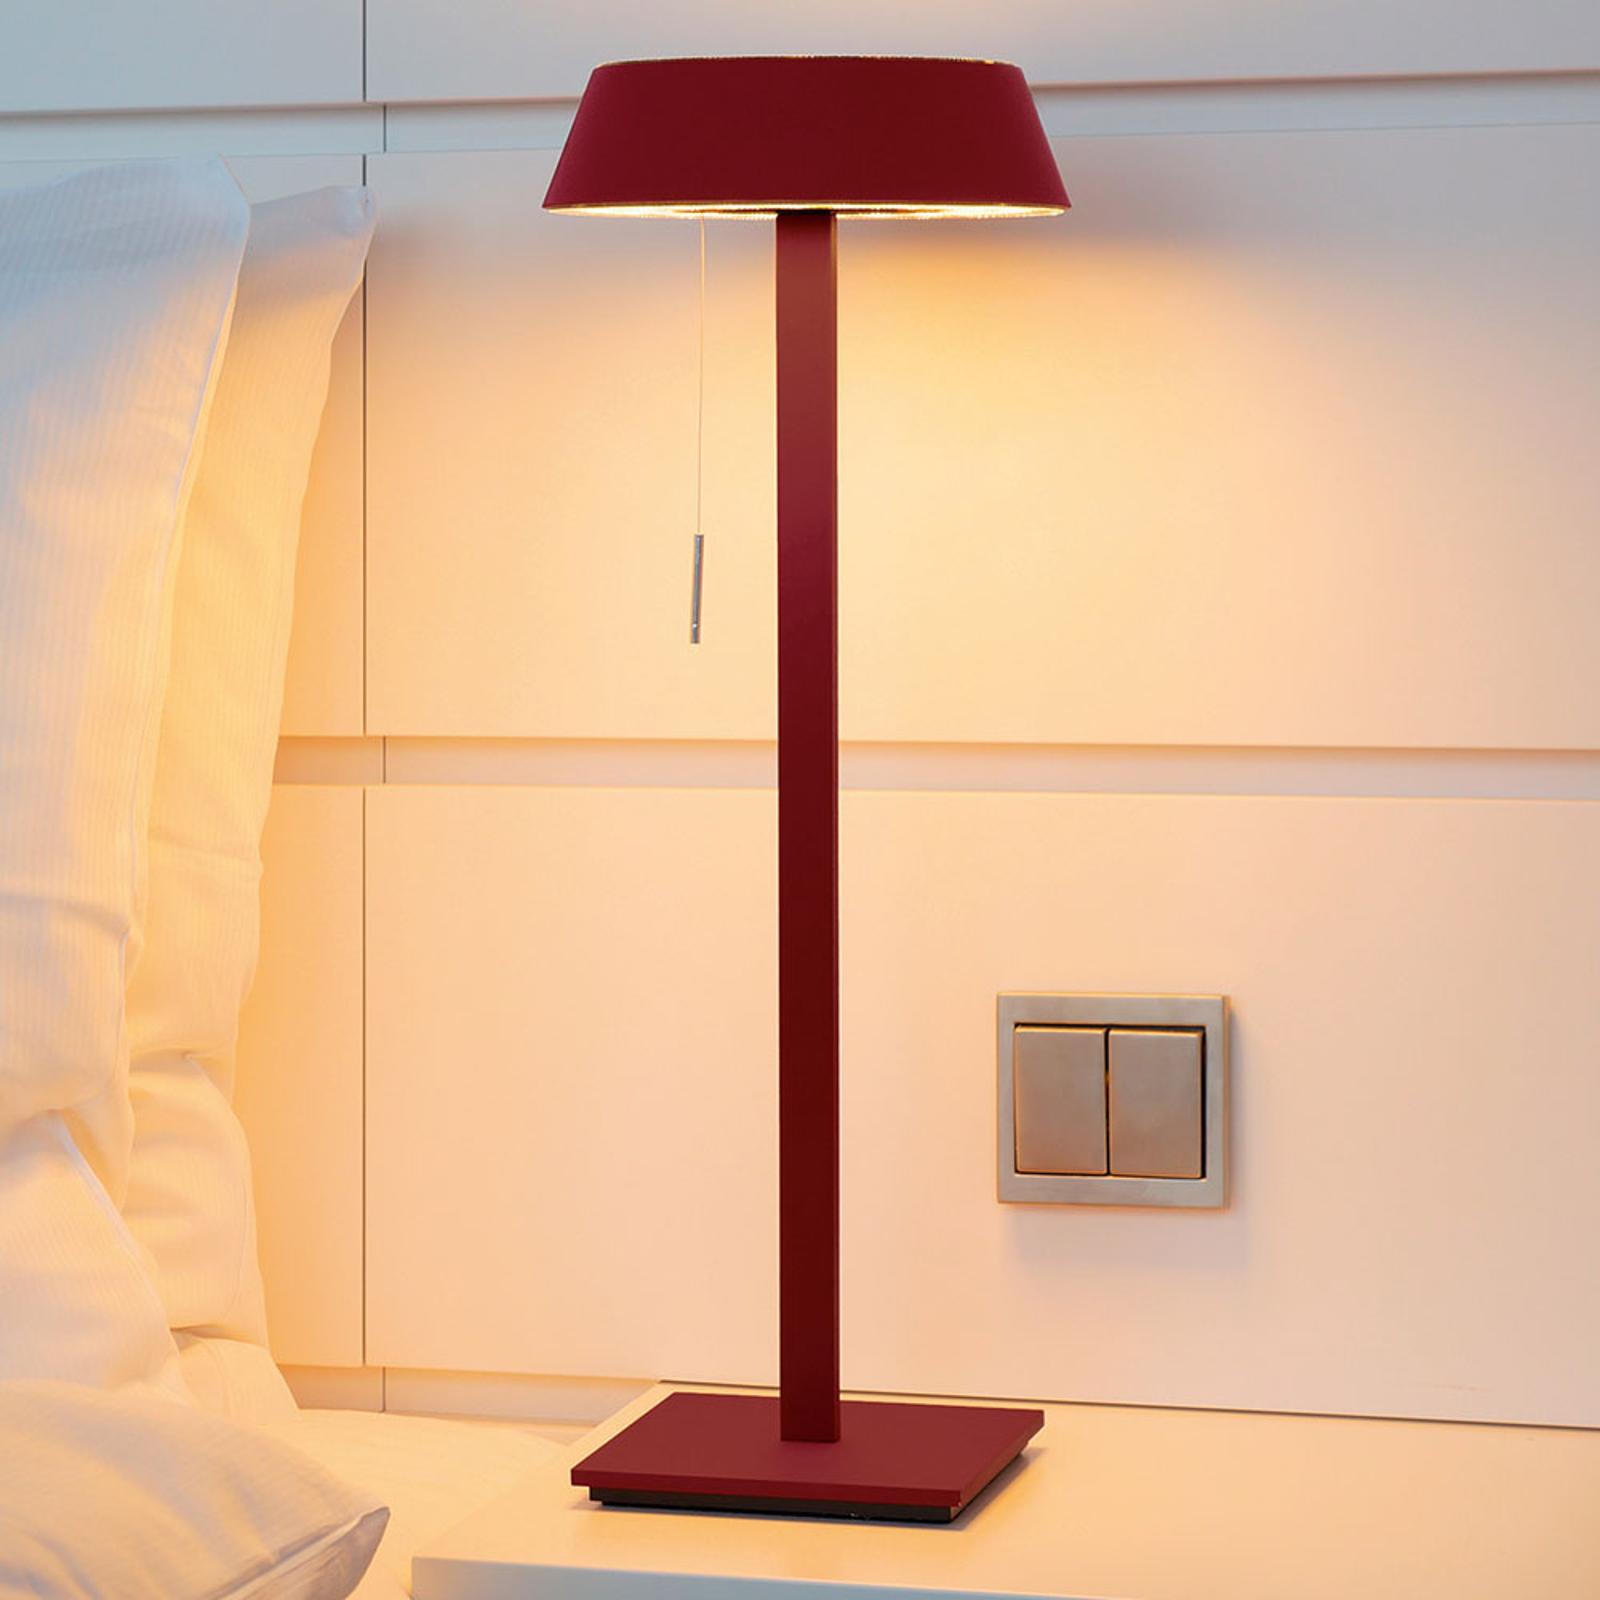 OLIGO Glance lampe à poser LED rouge mate